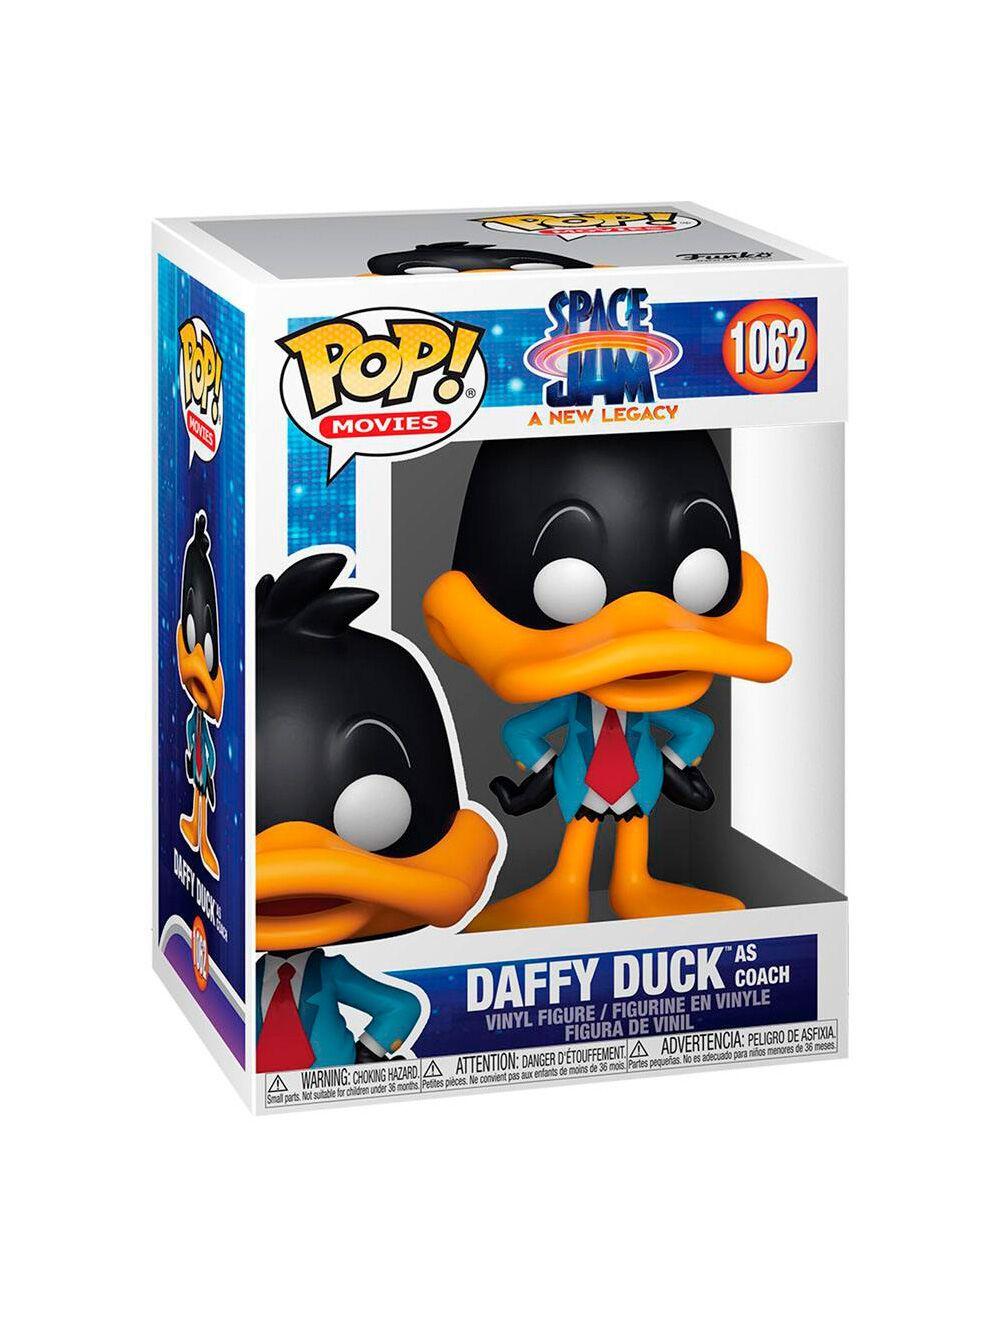 Funko POP! Space Jam 2 - Daffy Duck